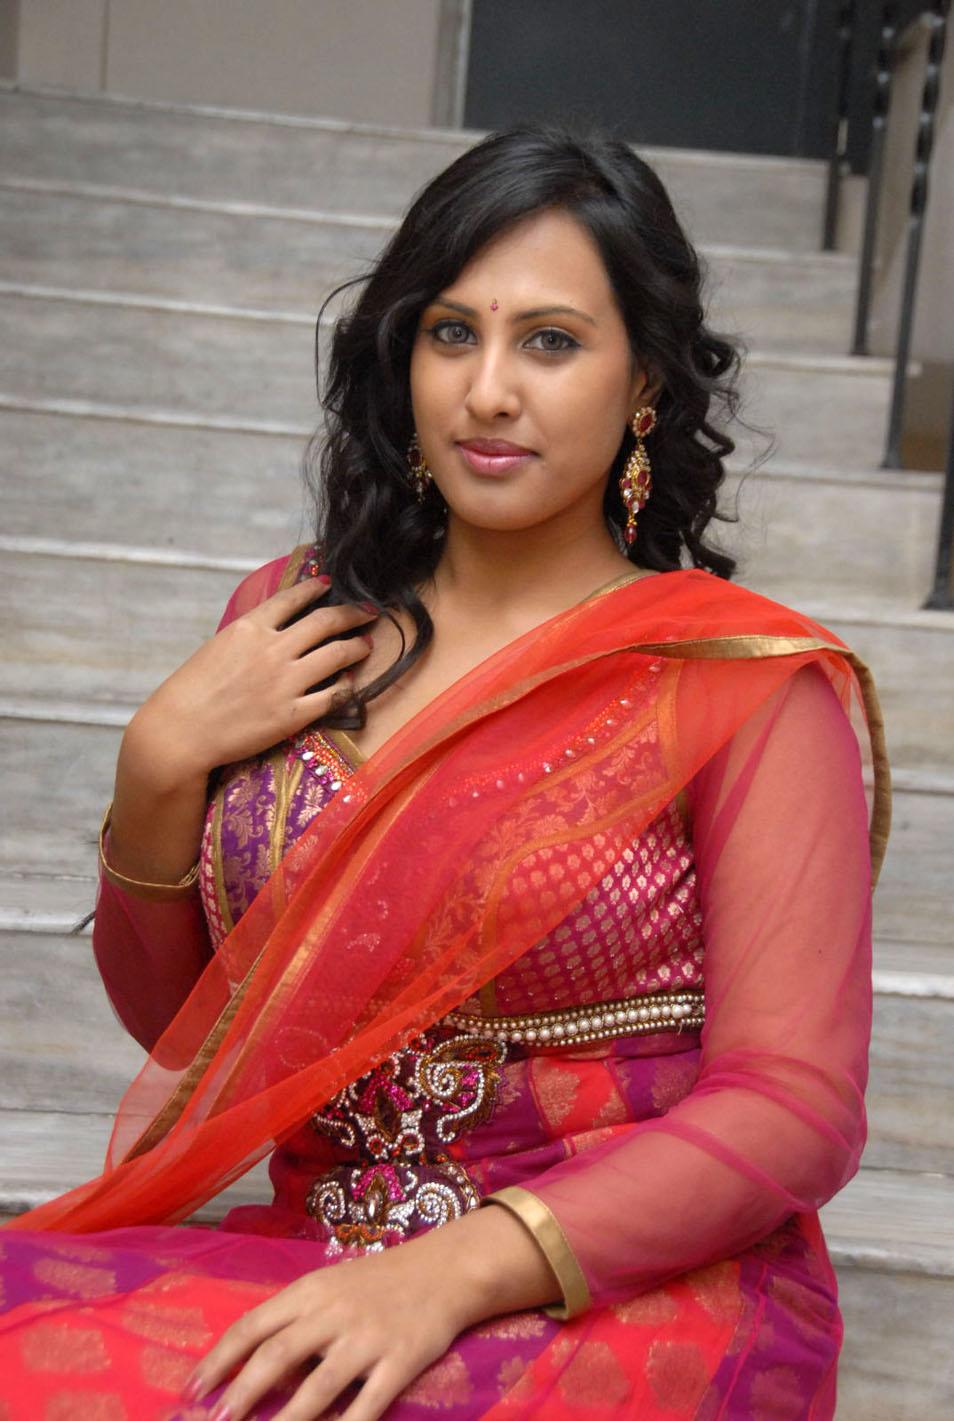 Indian Actress Hot Pics Indian Hot Aunty Boobs Pics-2362